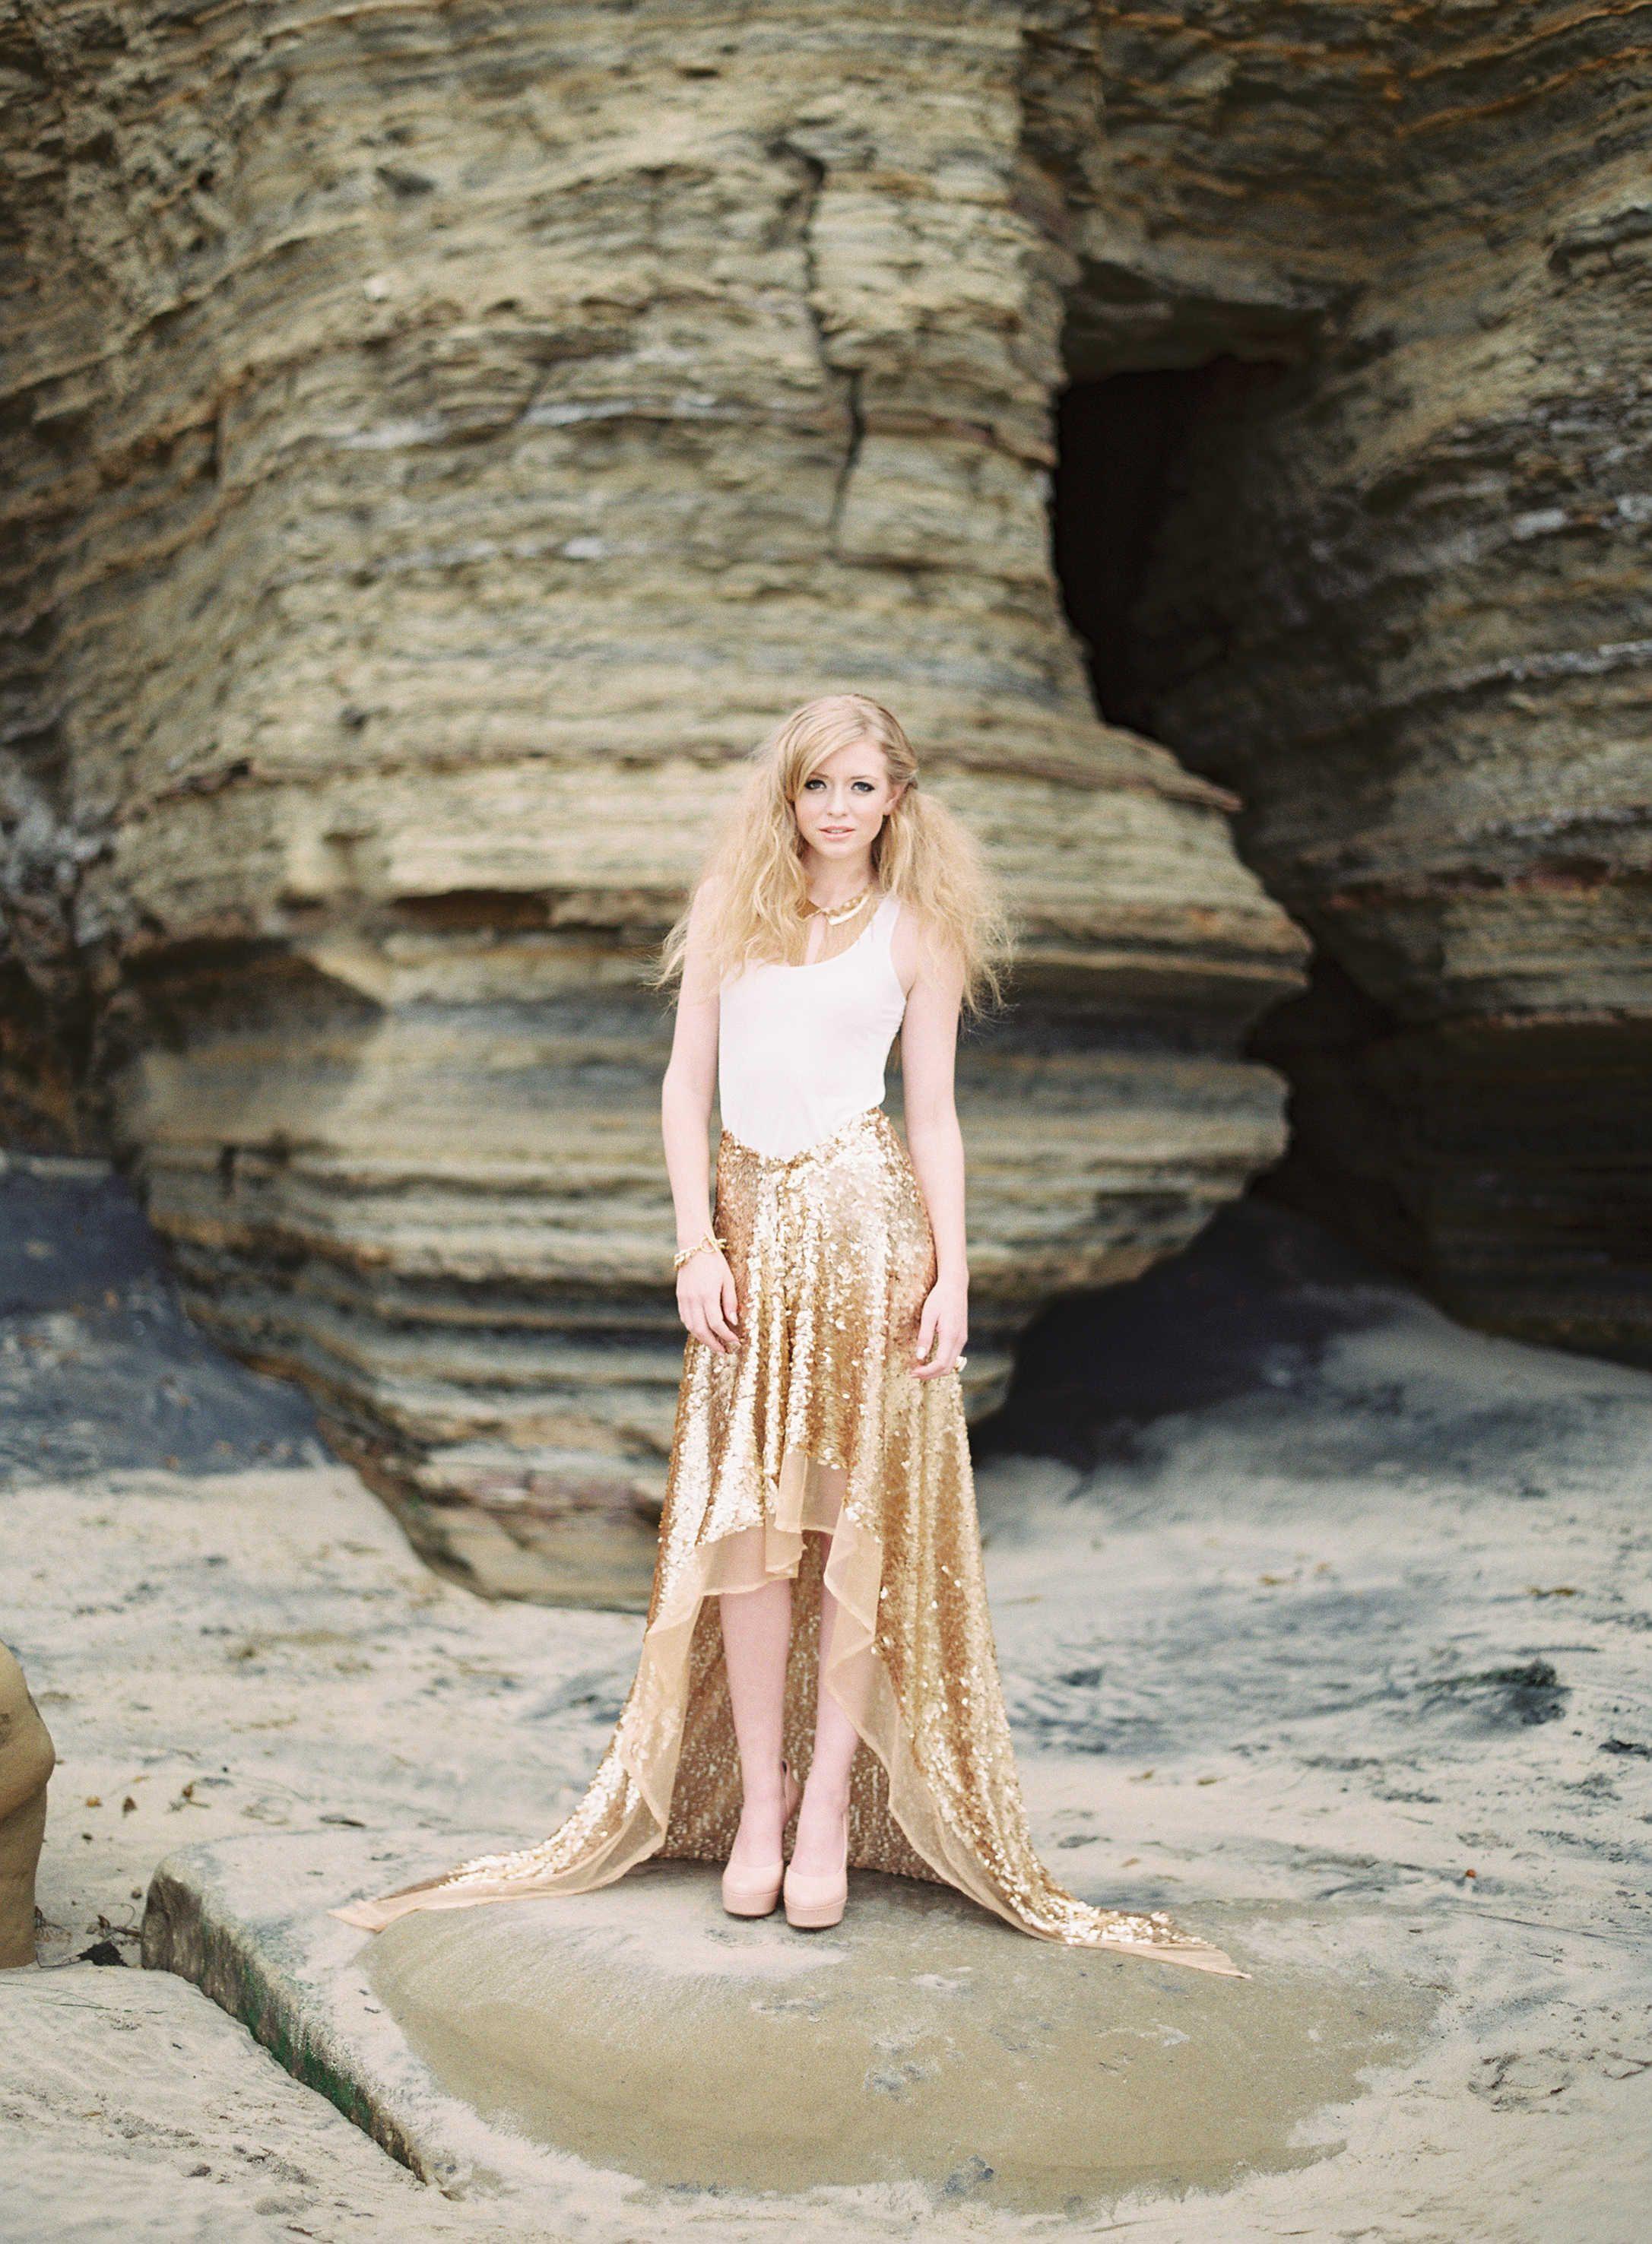 Strandhochzeit in Rosa und Gold ~ Styled Shoot ~ Ashley Kelem Photography | www.brautsalat.de